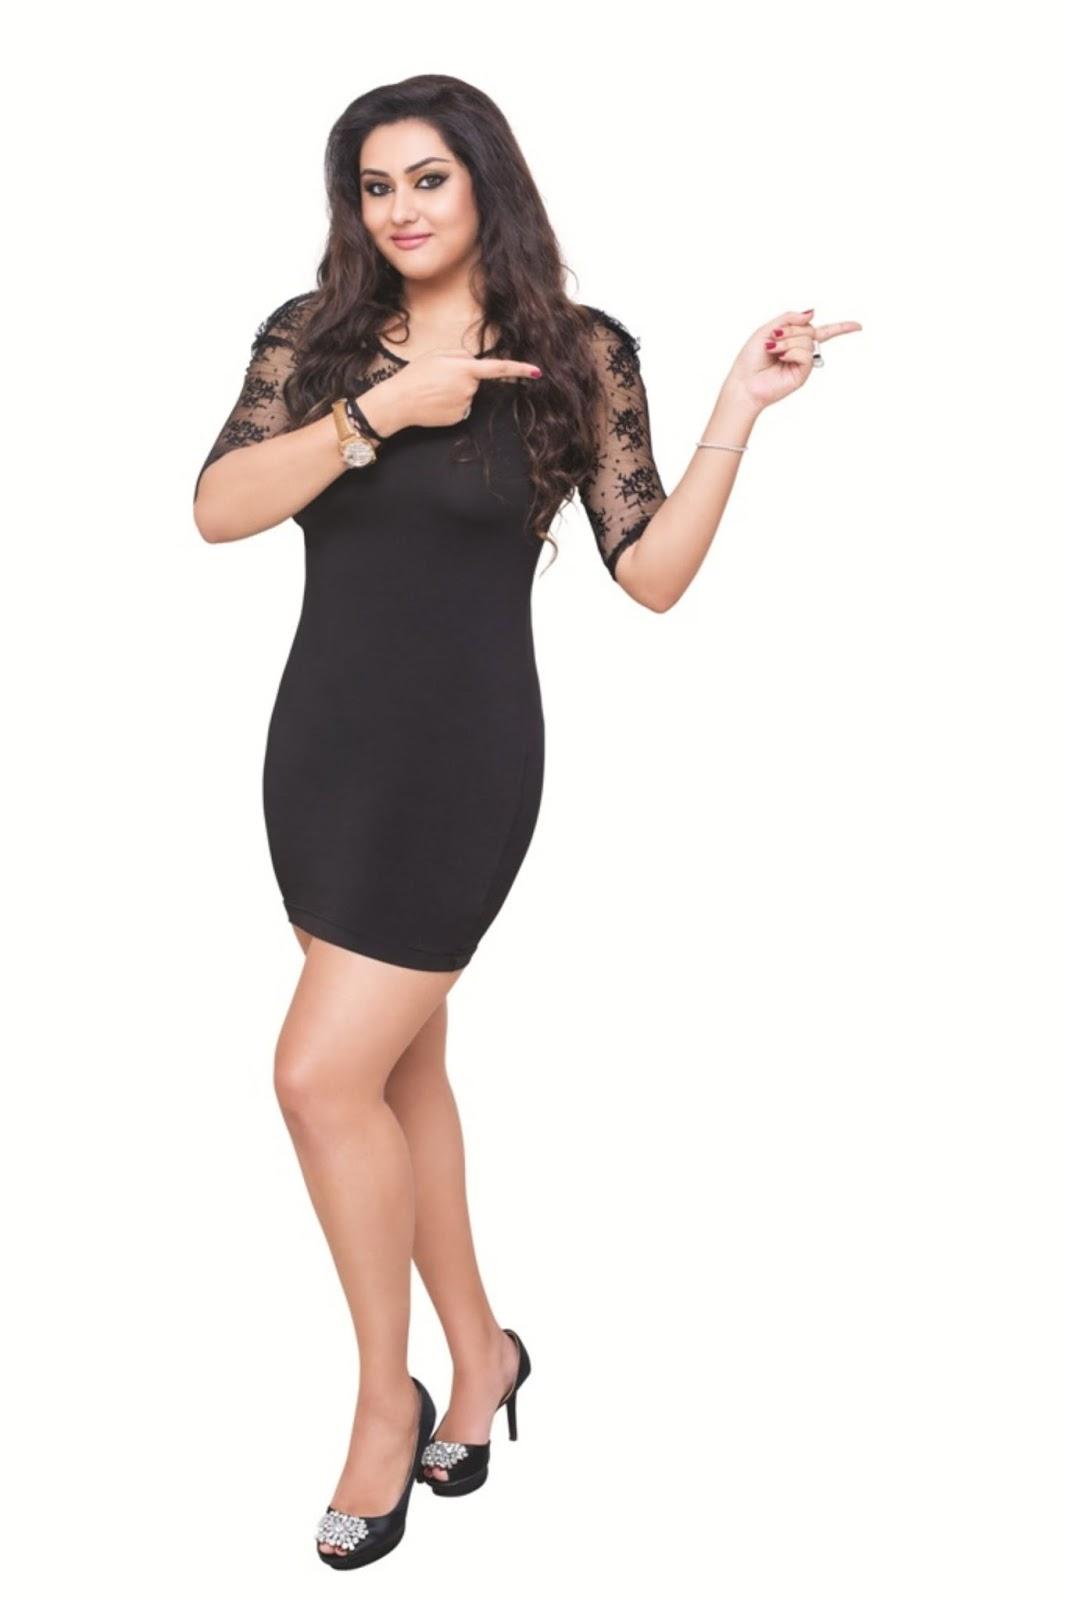 Actress Namitha Latest Photoshoot Stills after loosing weight